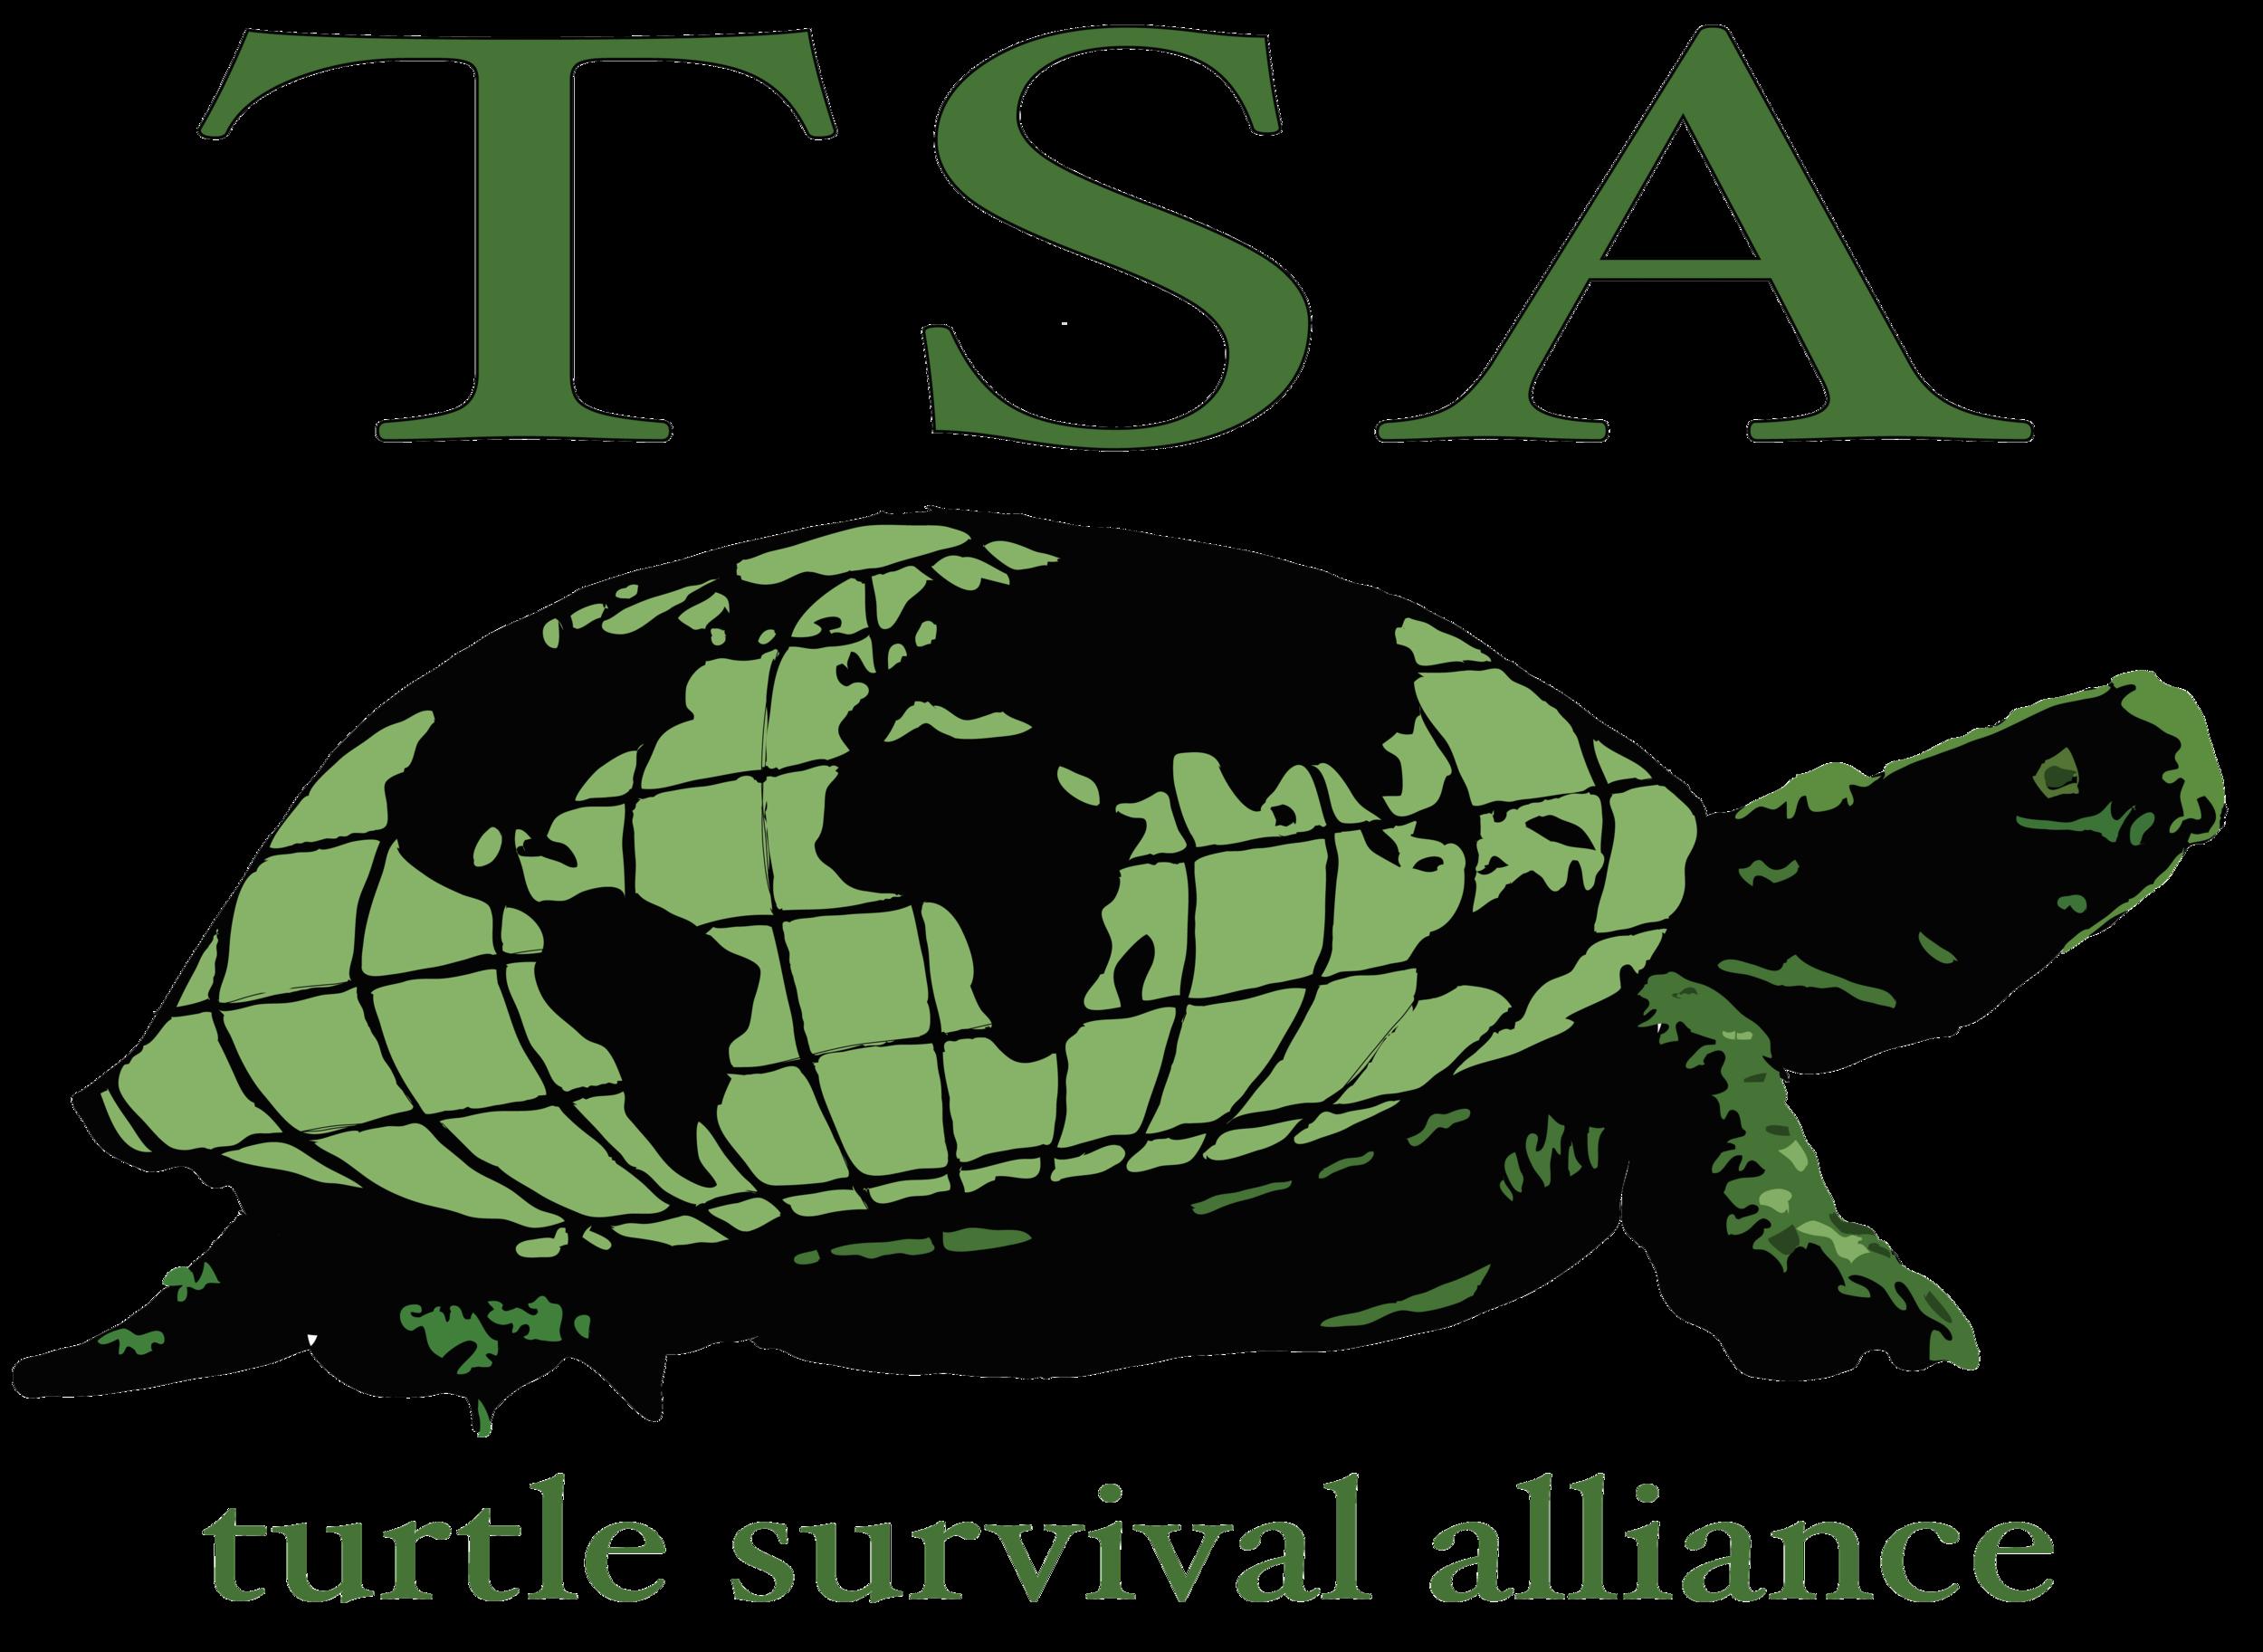 Turtle Survival Alliance